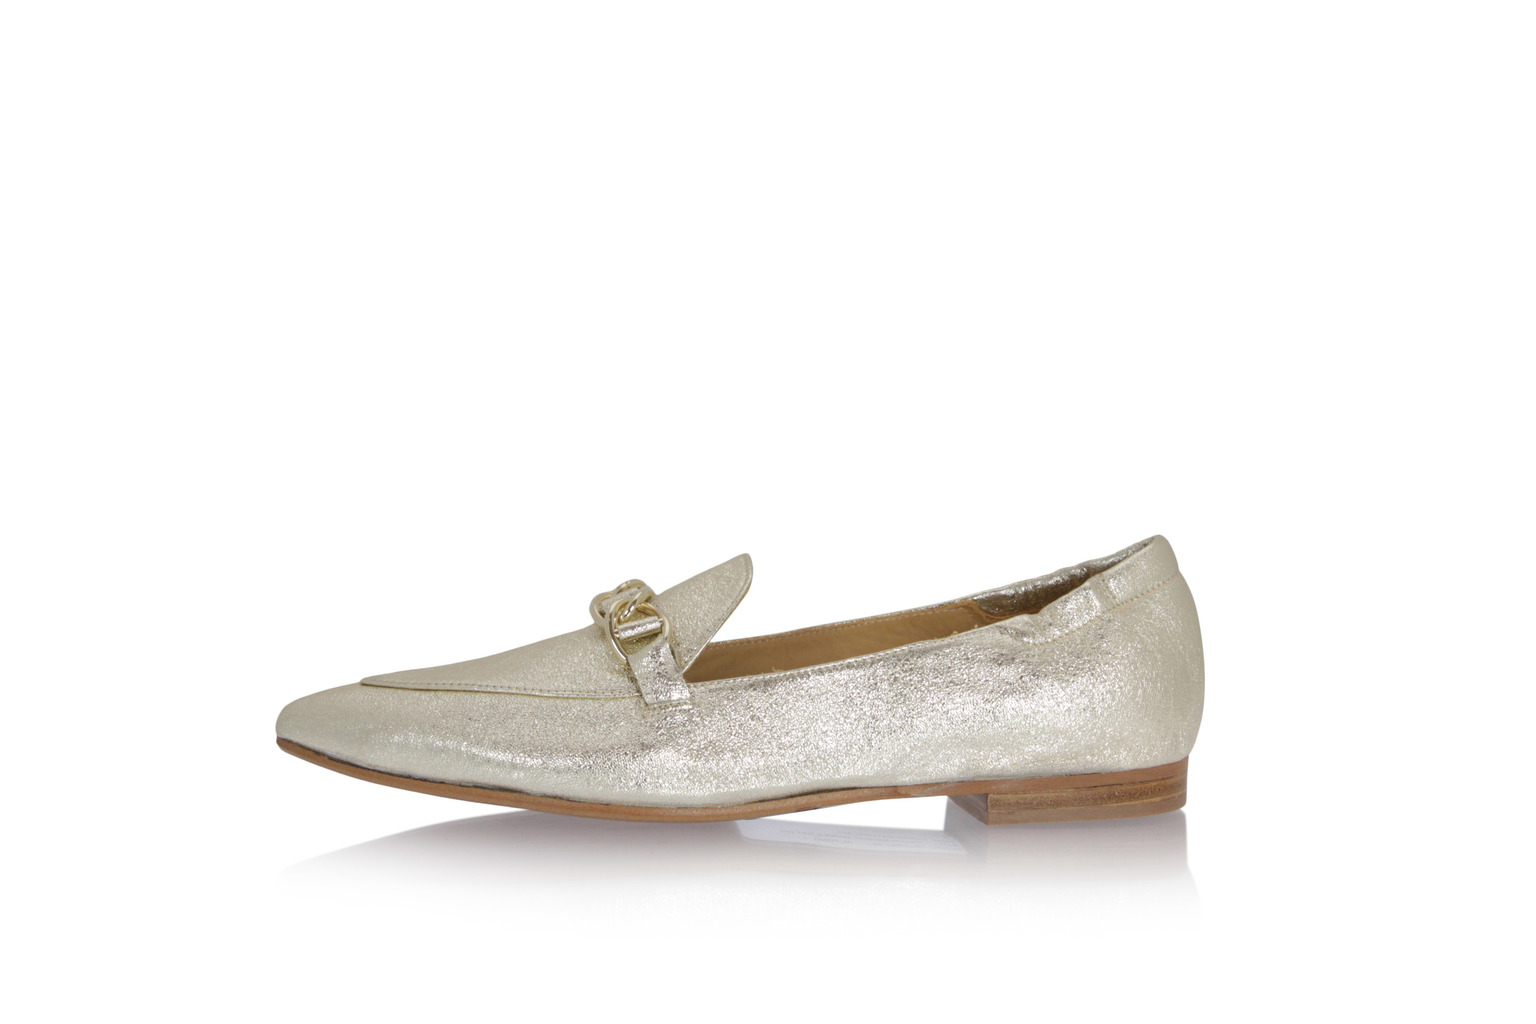 Billi Bi 54503 loafer